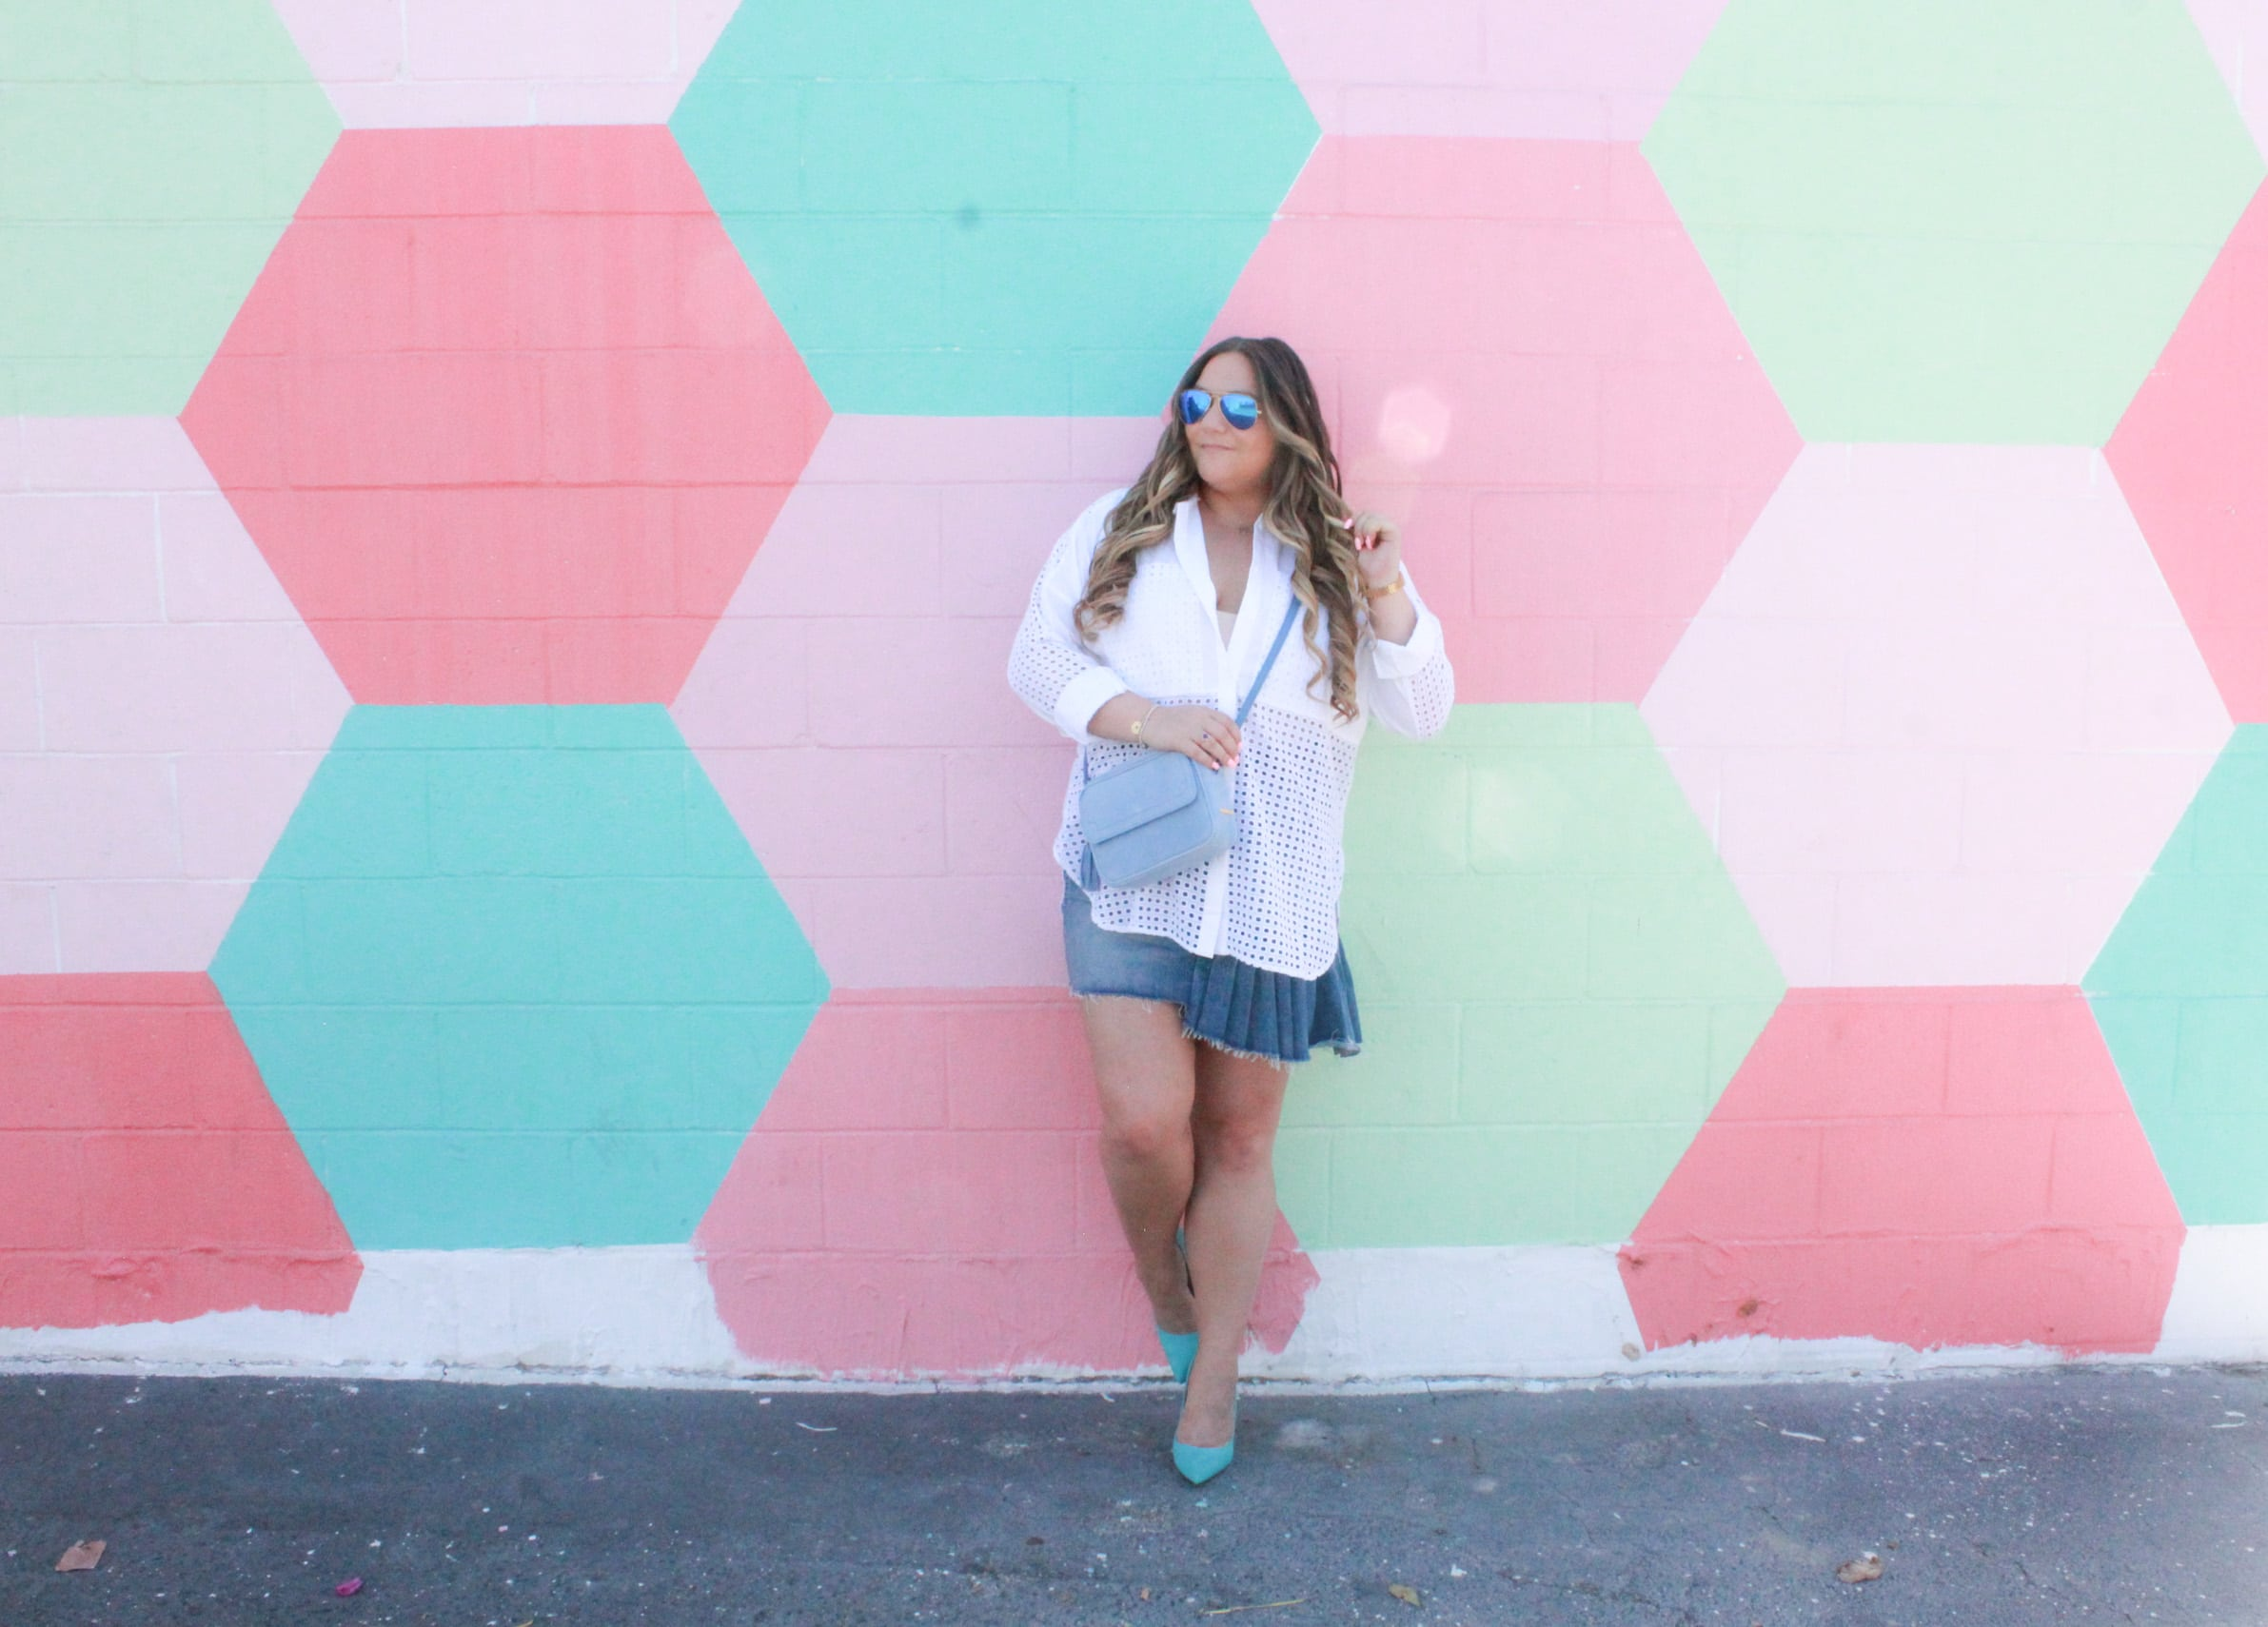 missyonmadison, missyonmadison blog, bloglovin, fashion blog, fashion blogger, style blog, style blogger, fashion inspo, outfit inspo, habitual, habitual denim skirt, perforated blouse, white button down blouse, white button down shirt, denim skirt, la blogger, style diaries, ami clubwear, ami clubwear heels, teal heels, teal pumps, blue pumps, blue heels, summer outfit inspo, gigi new york, gigi new york crossbody bag,